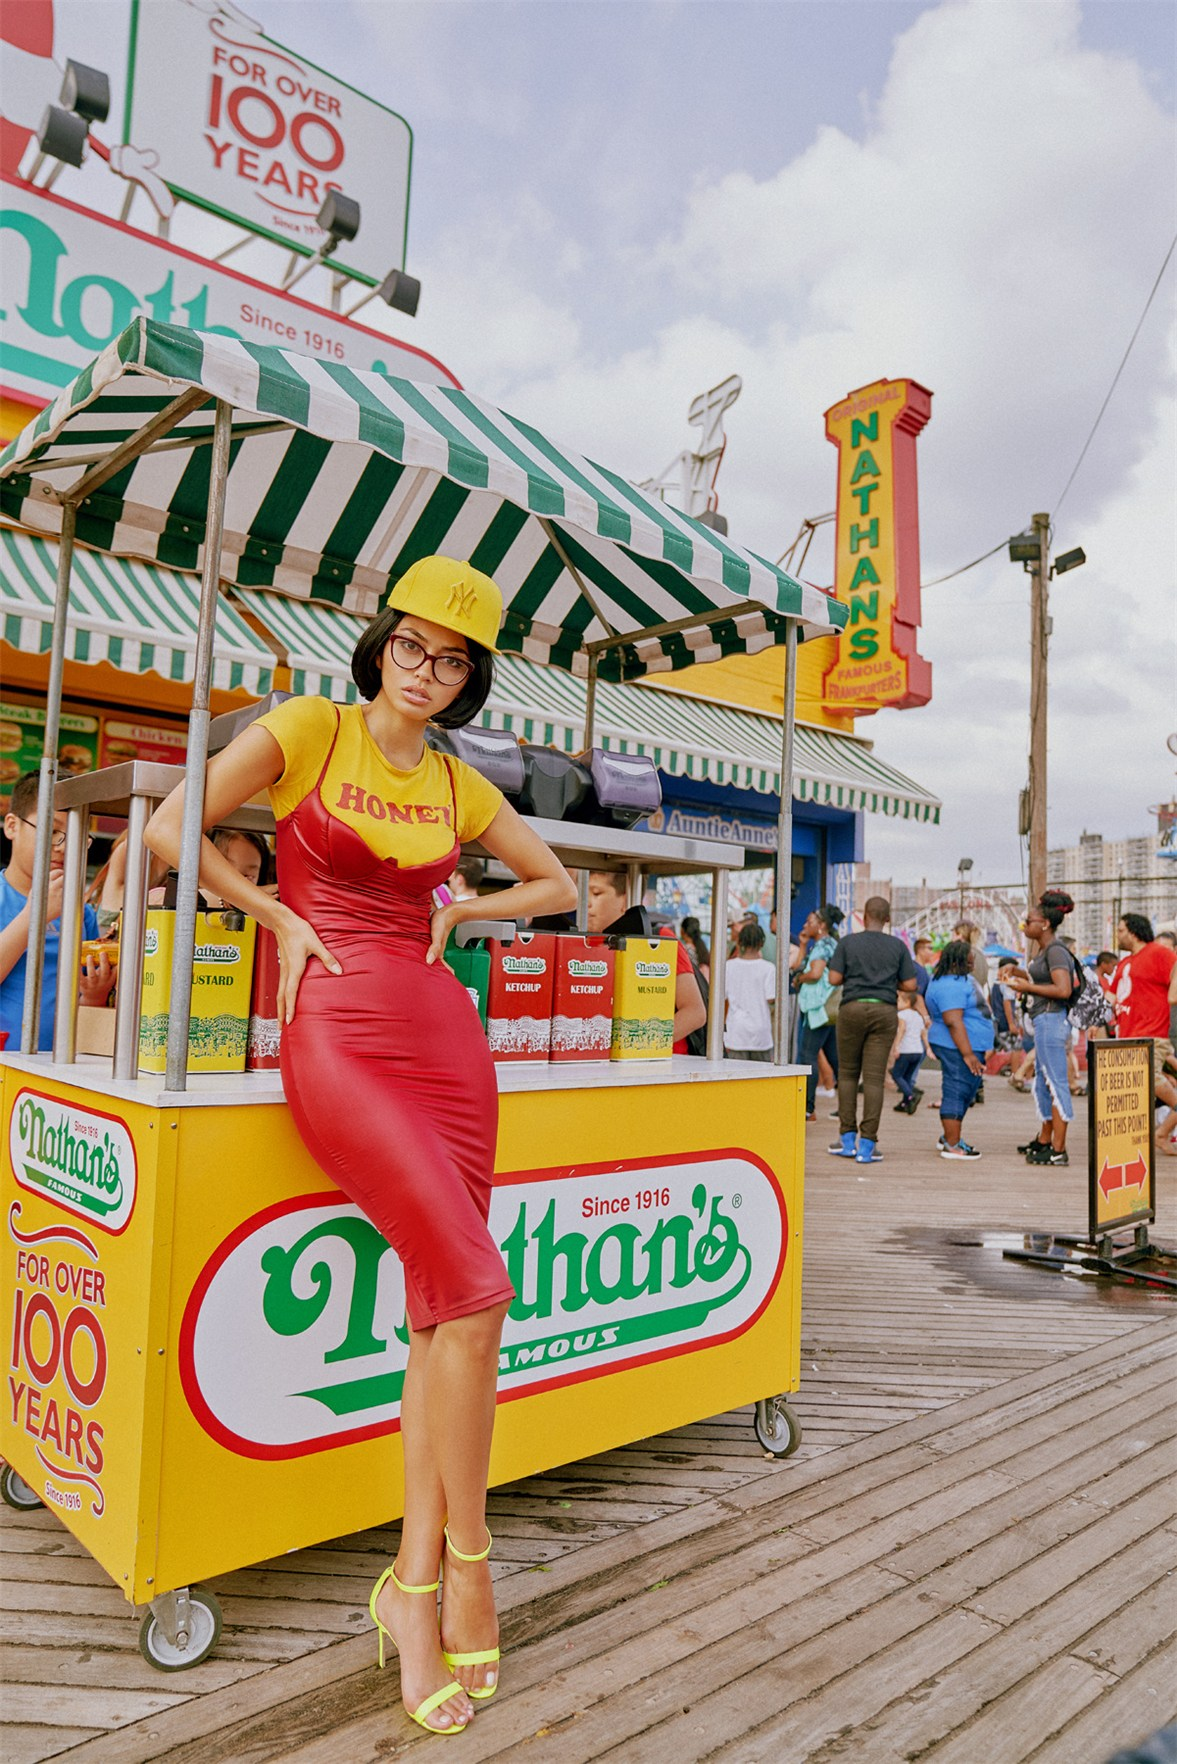 Прогулка по Кони-Айленду с Амброй Гутиерес / Ambra Battilana Gutierrez by Alexei Bazdarev / Coney Island adventure